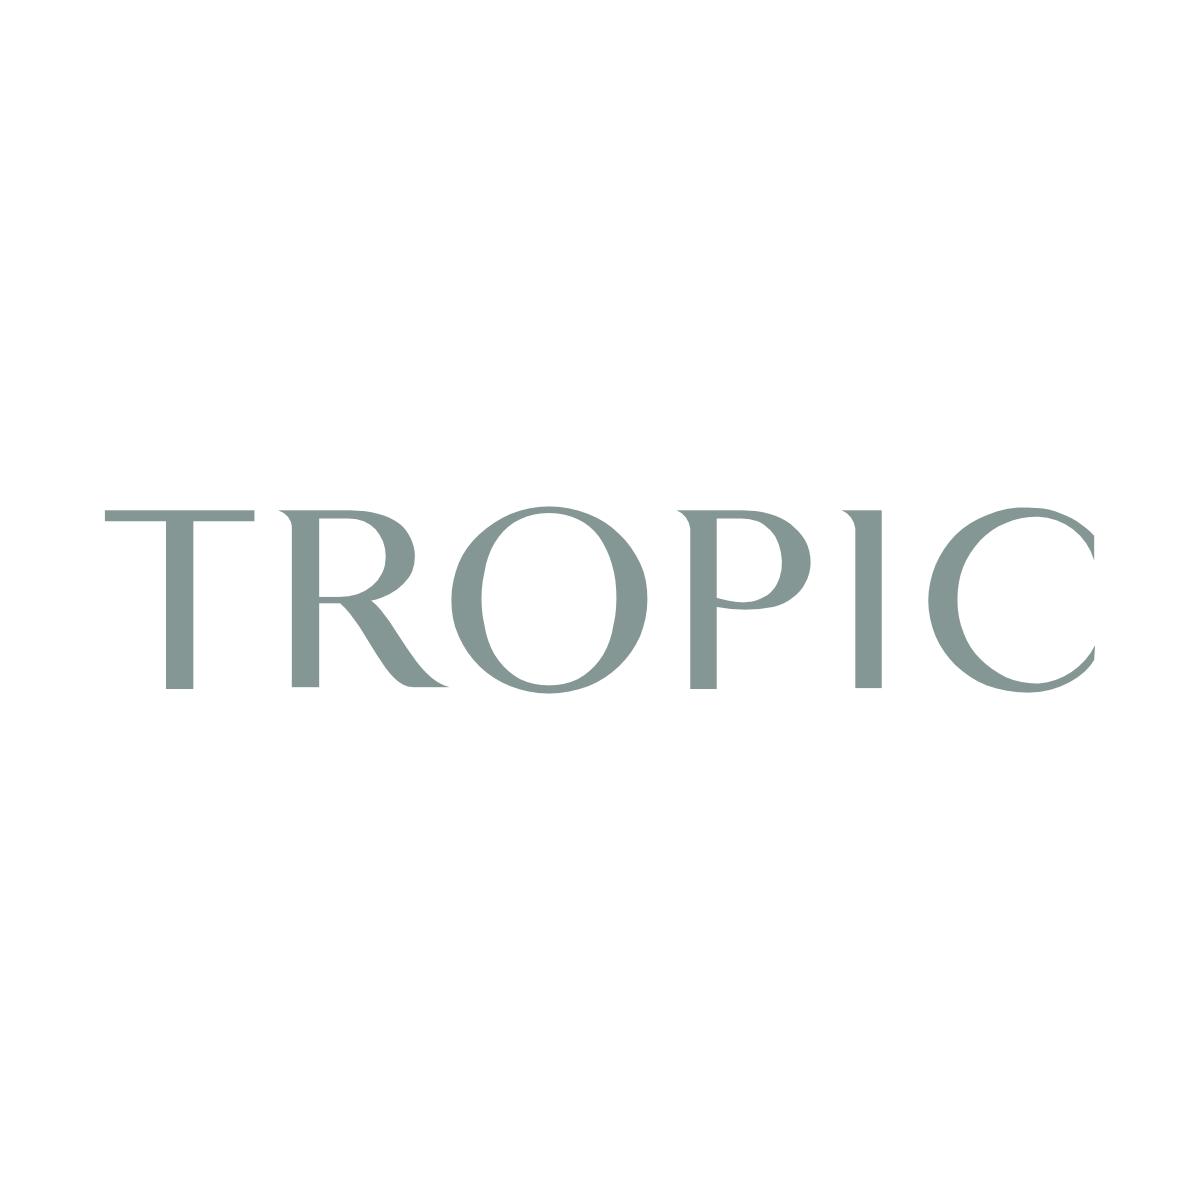 Tropic Skincare Logo